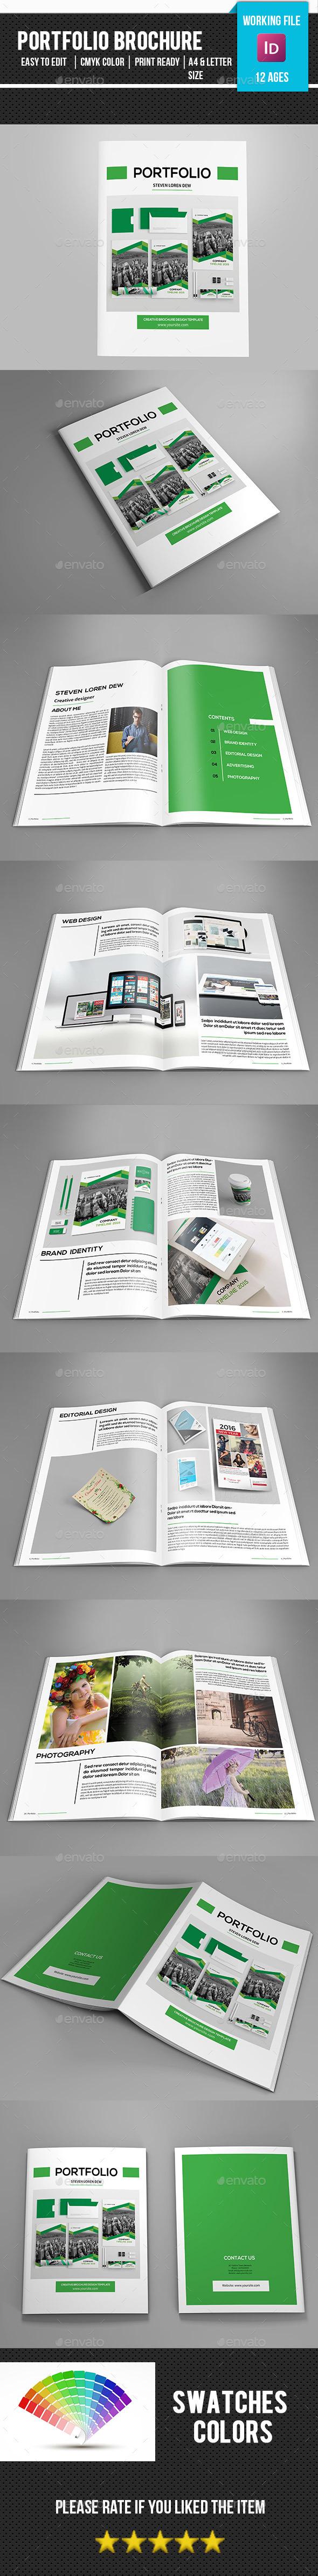 Portfolio Brochure Template-V321 - Portfolio Brochures